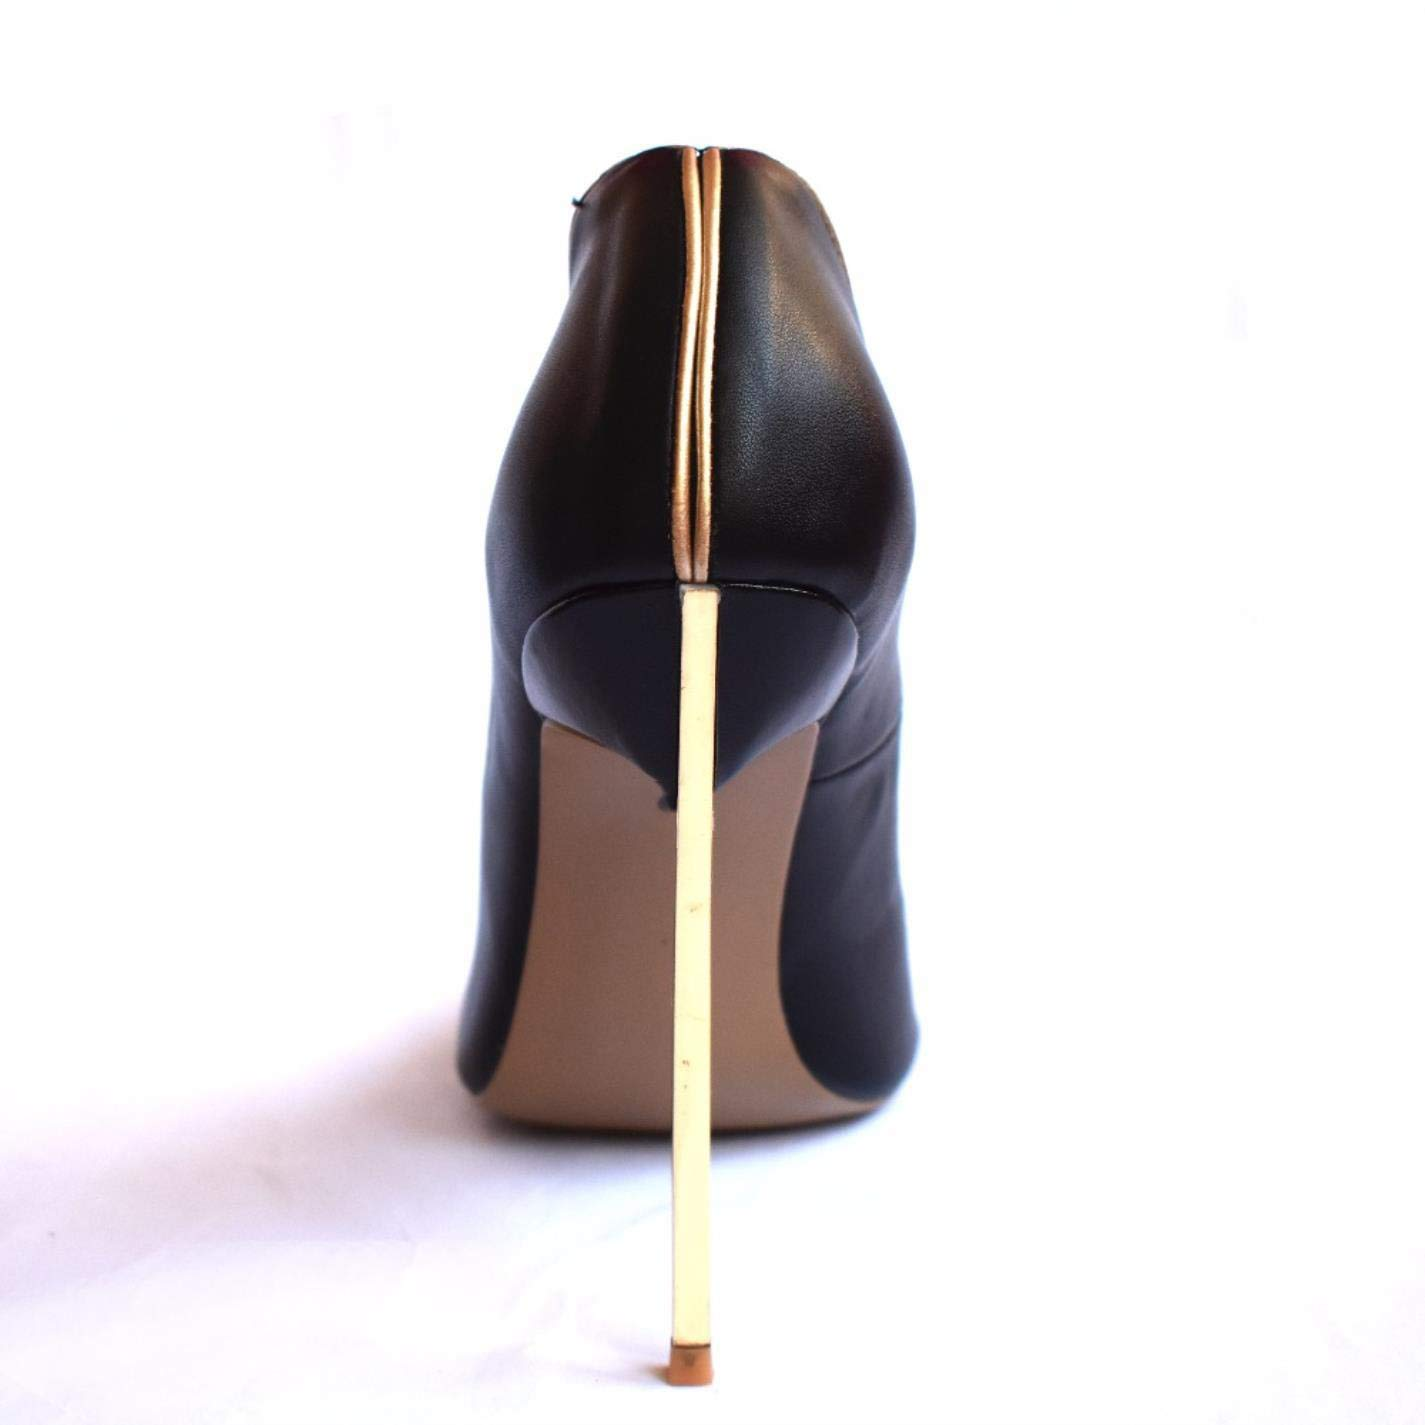 High Heels Pumps Leather Dress Shoes For Women 12cm Stiletto